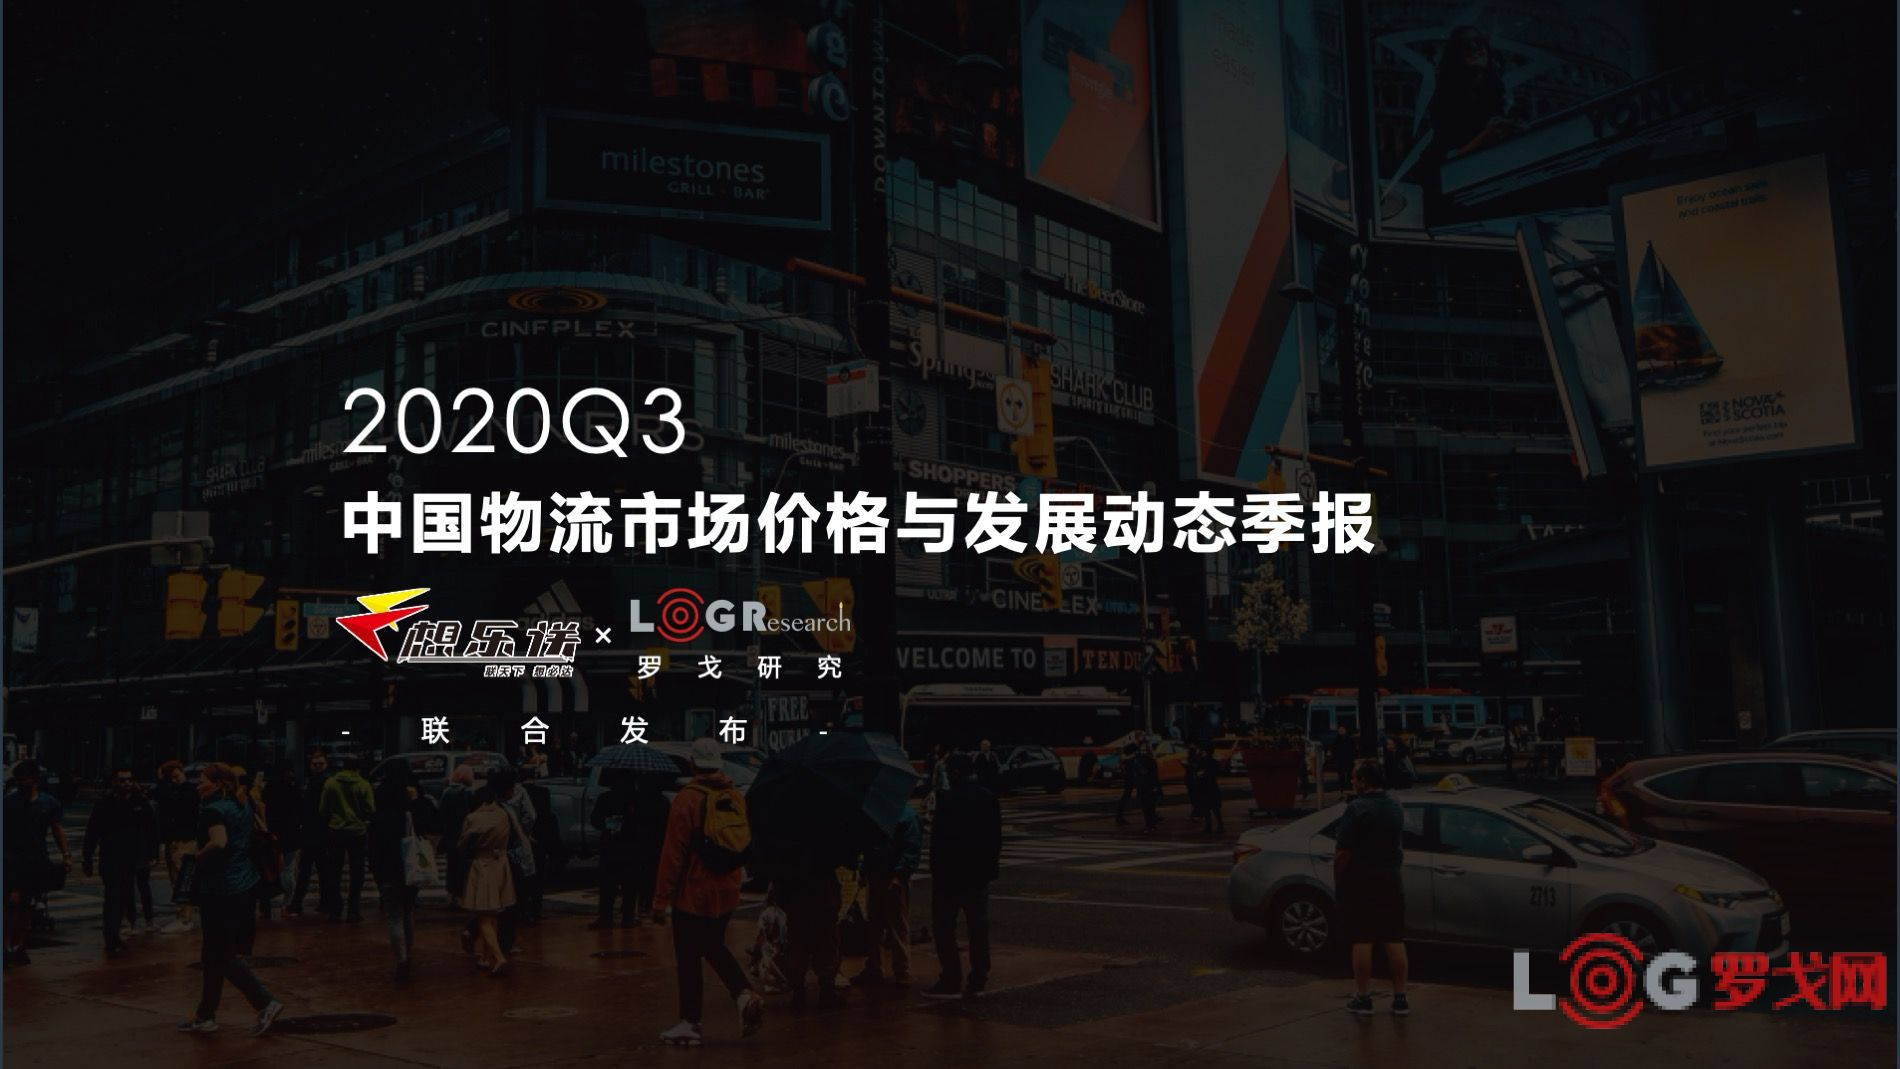 2020Q3中国物流市场价格与发展动态季报 | 联想物流&罗戈研究